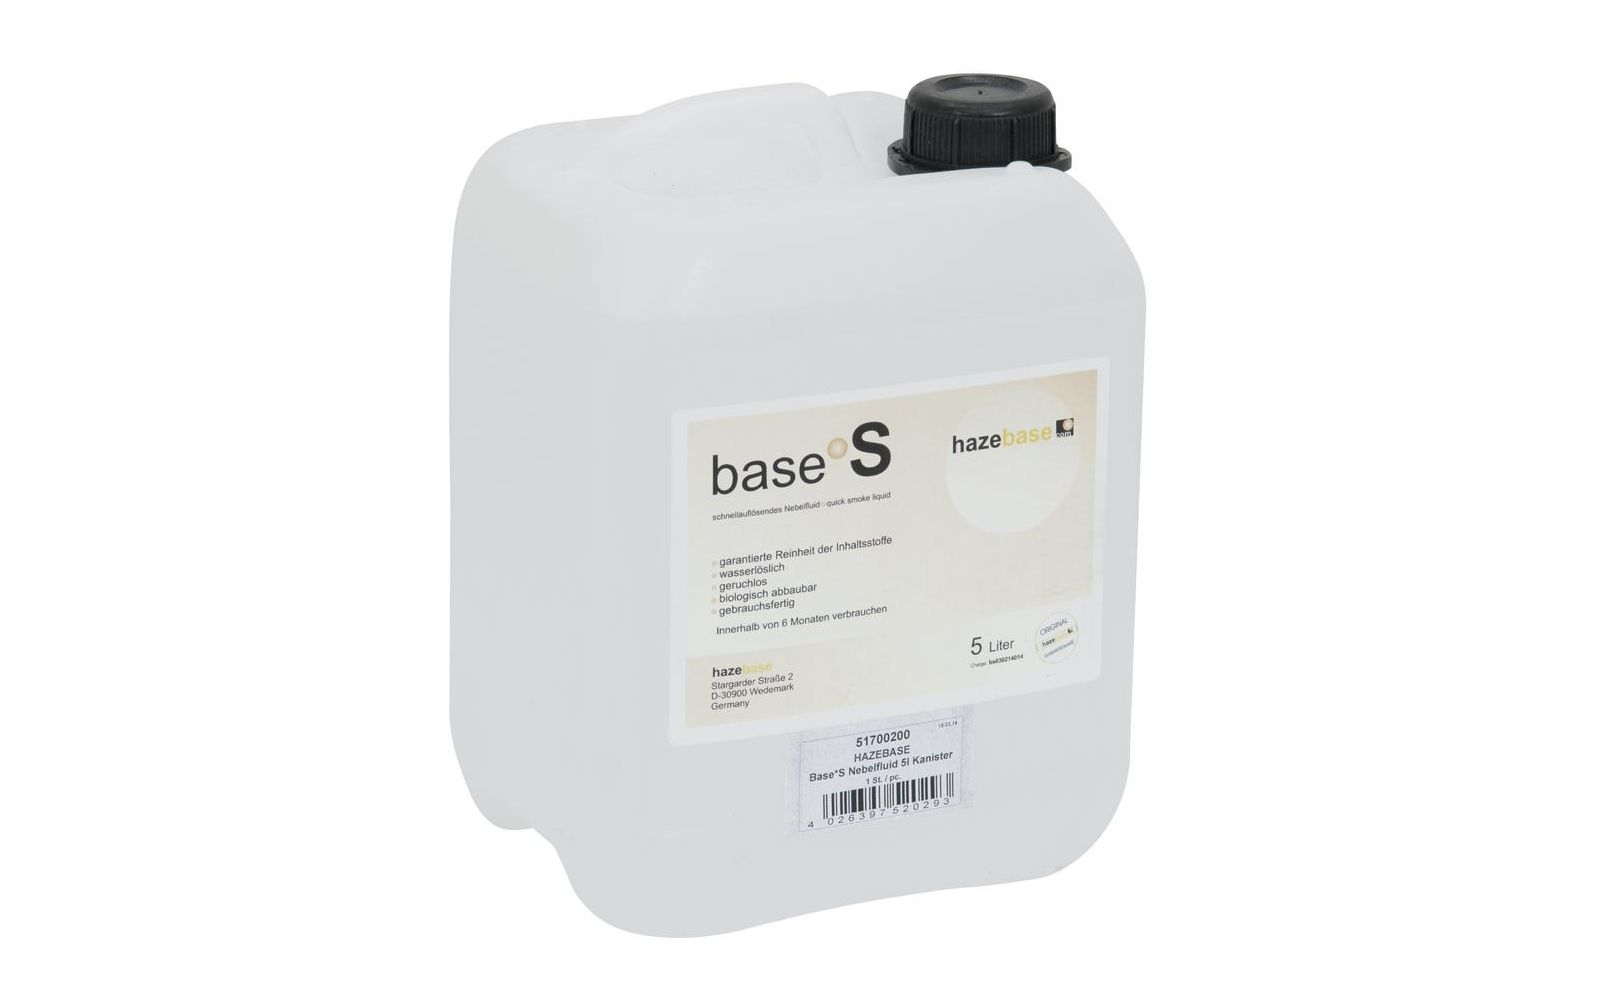 hazebase-base-s-nebelfluid-5l-kanister